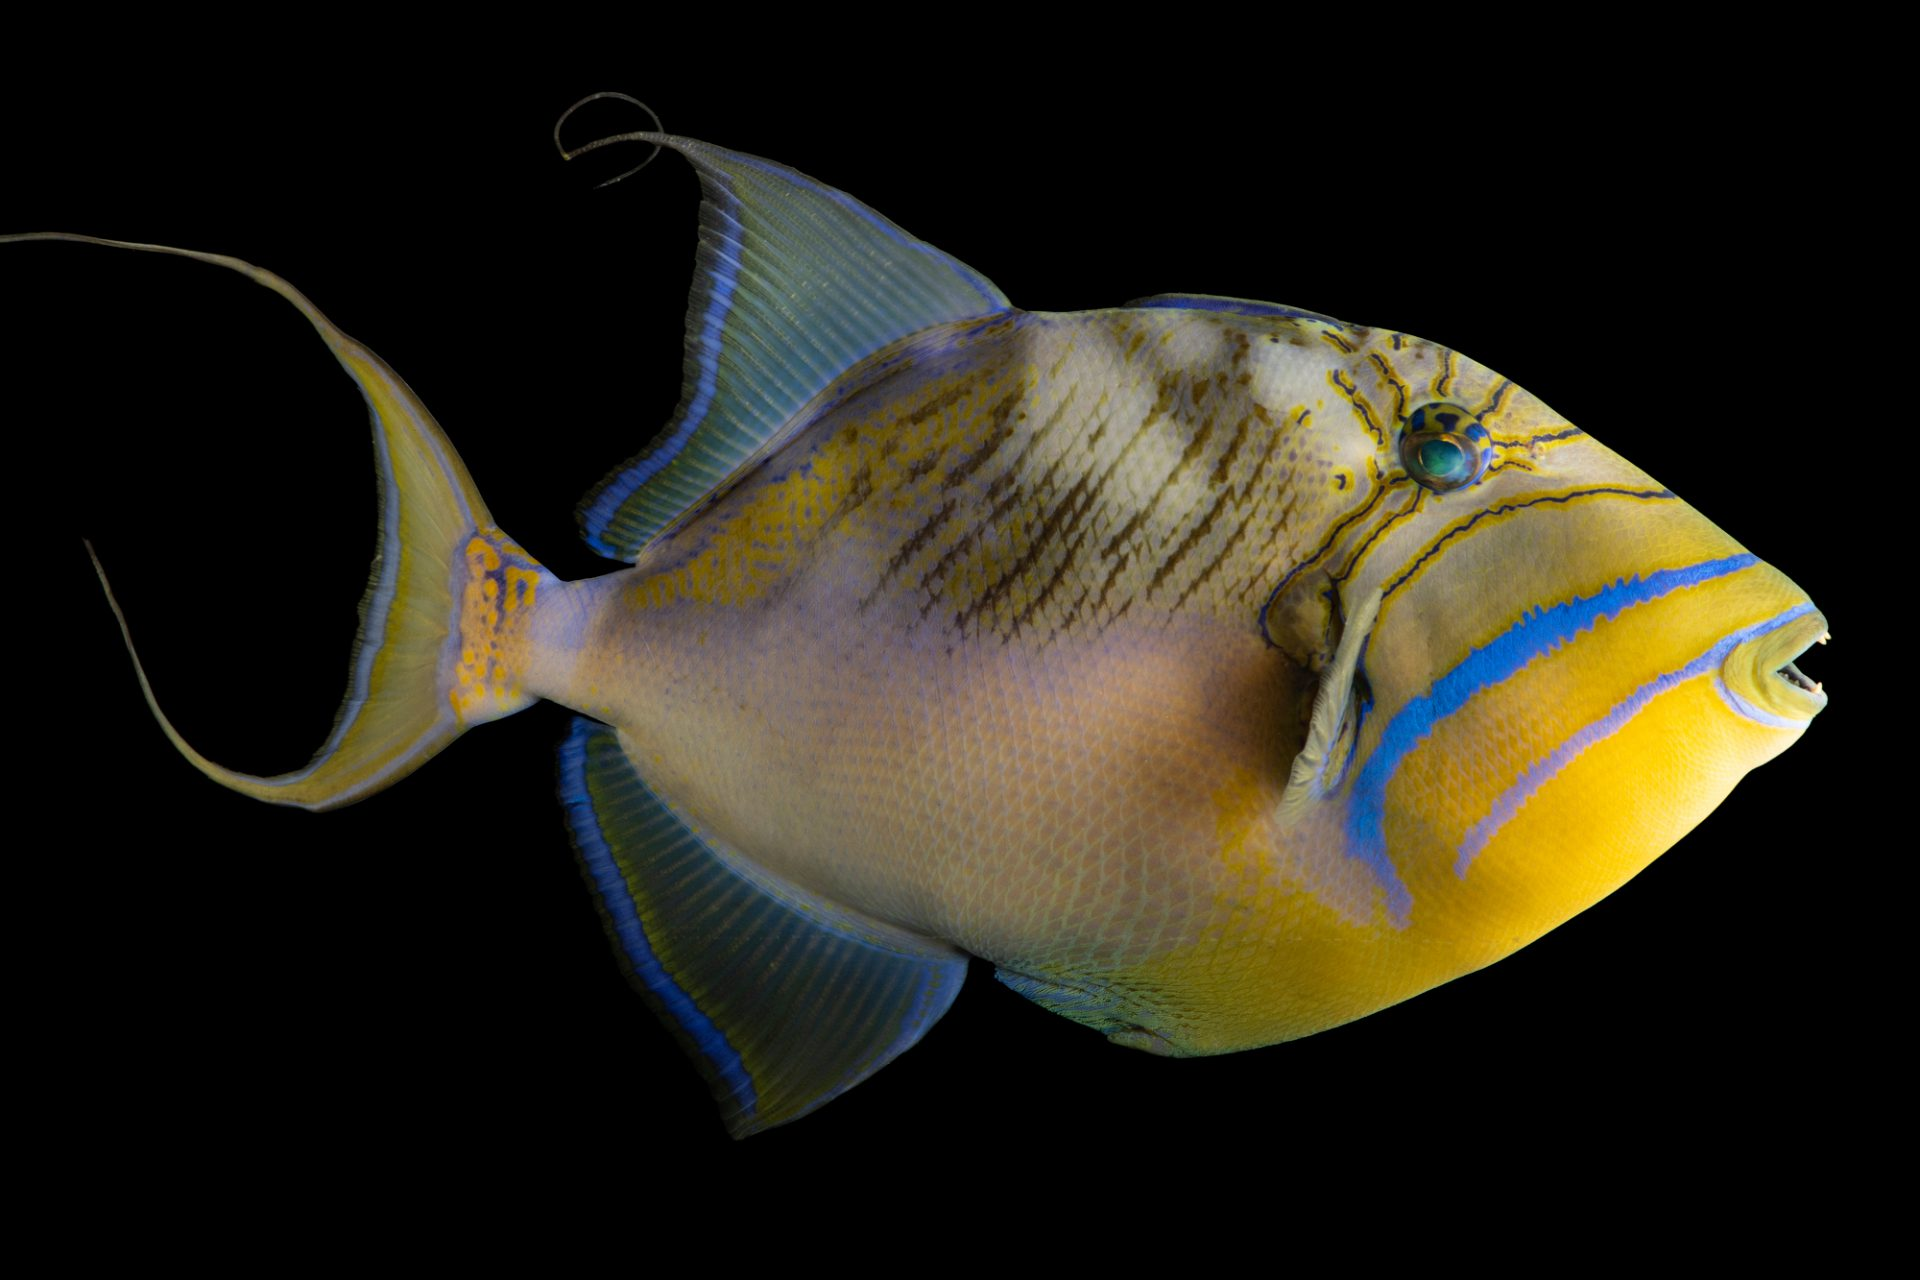 Photo: Queen triggerfish (Balistes vetula) at the Omaha Zoo.